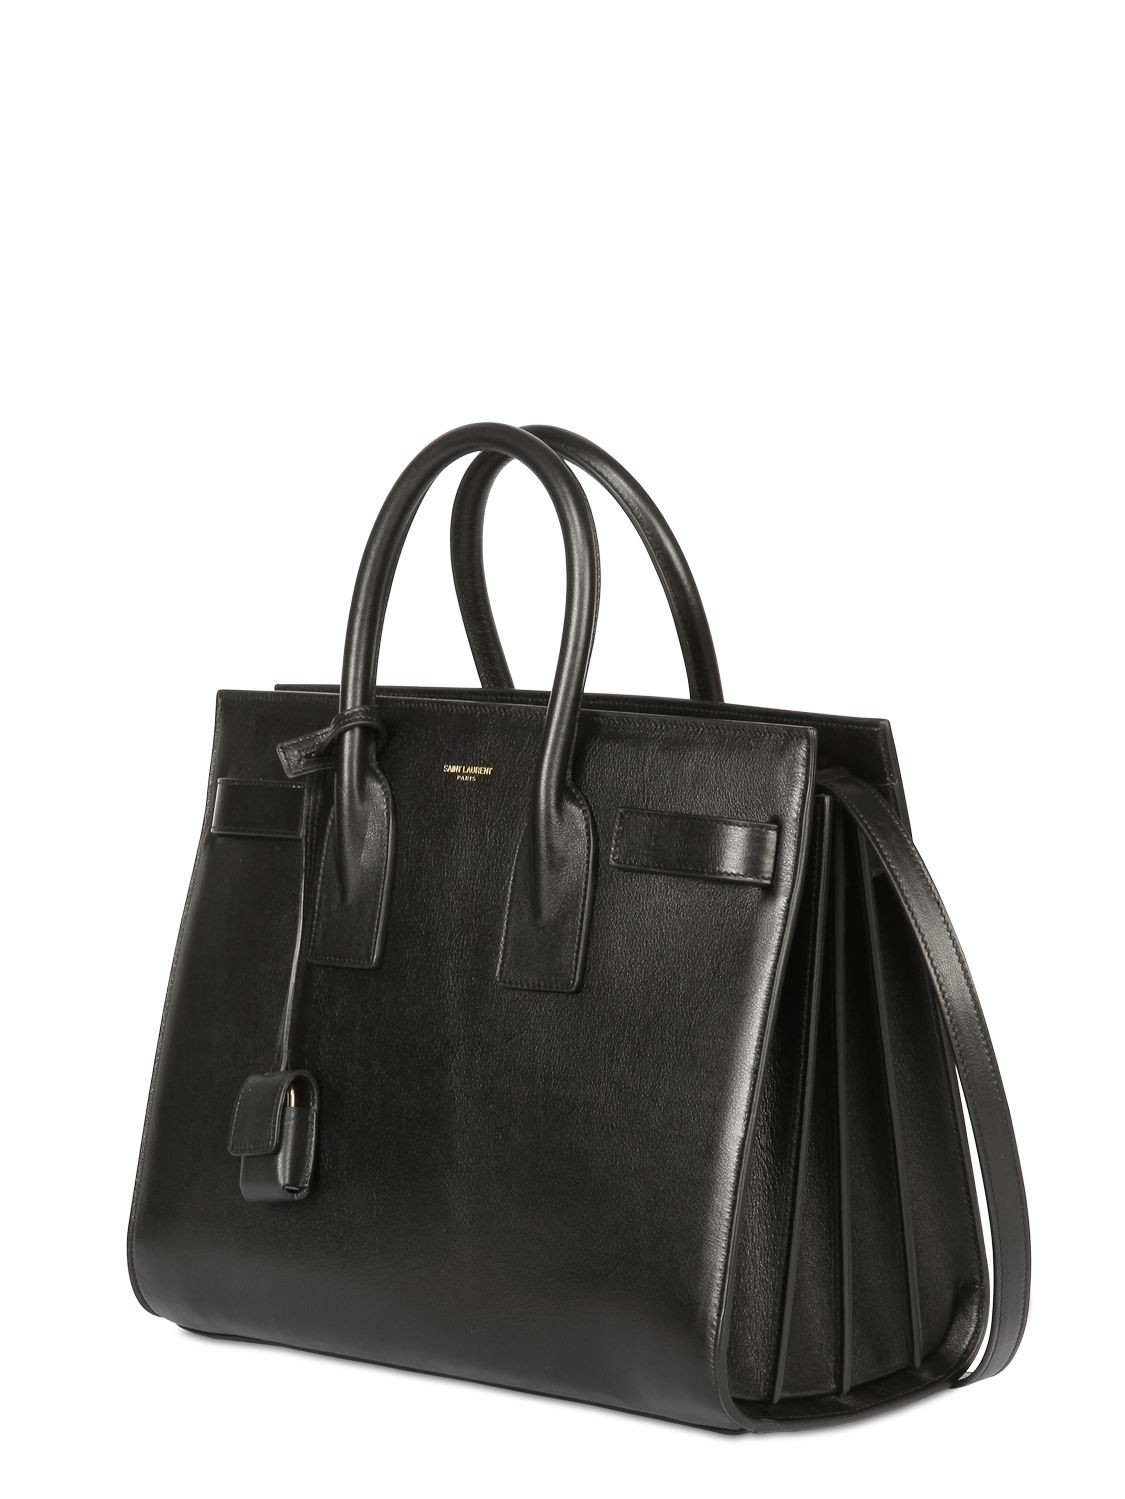 classic small sac de jour bag in black leather  duffle bag ysl